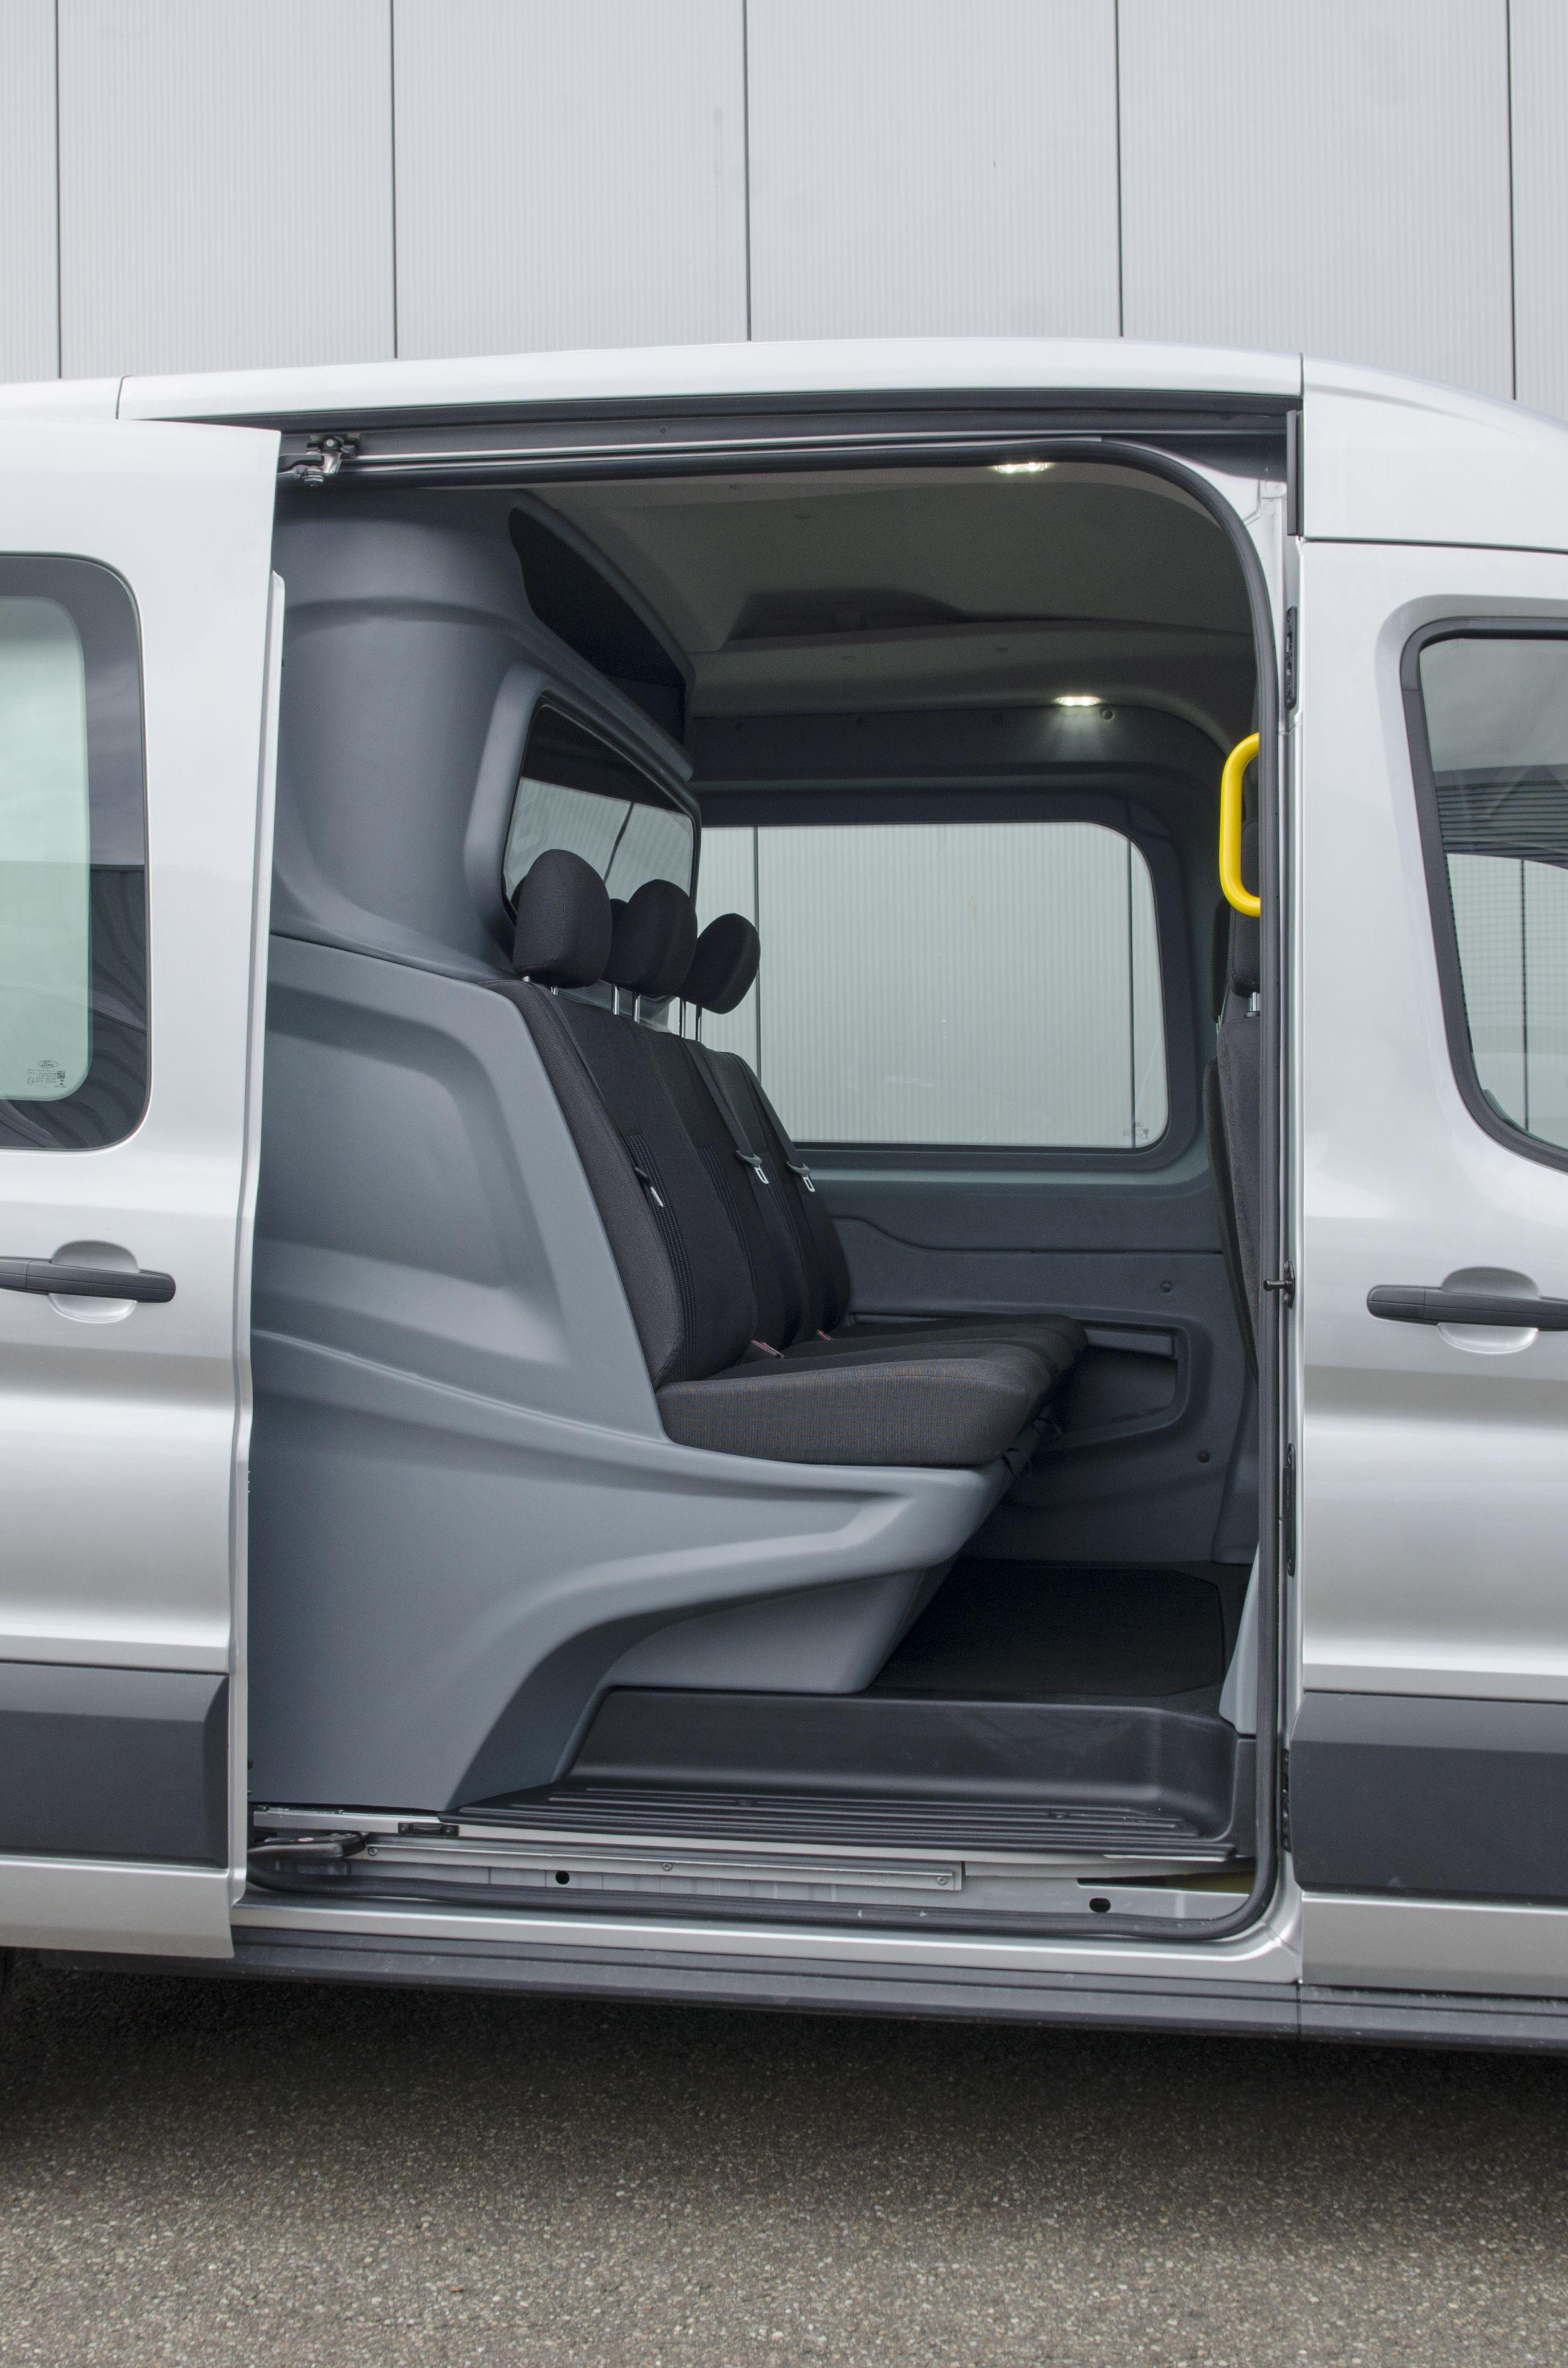 Side View Into The Vans Cab Area Ford Transit Luxury Double Cab Van Line Ni Ford Transit Luxury Double Cab Karavanlar